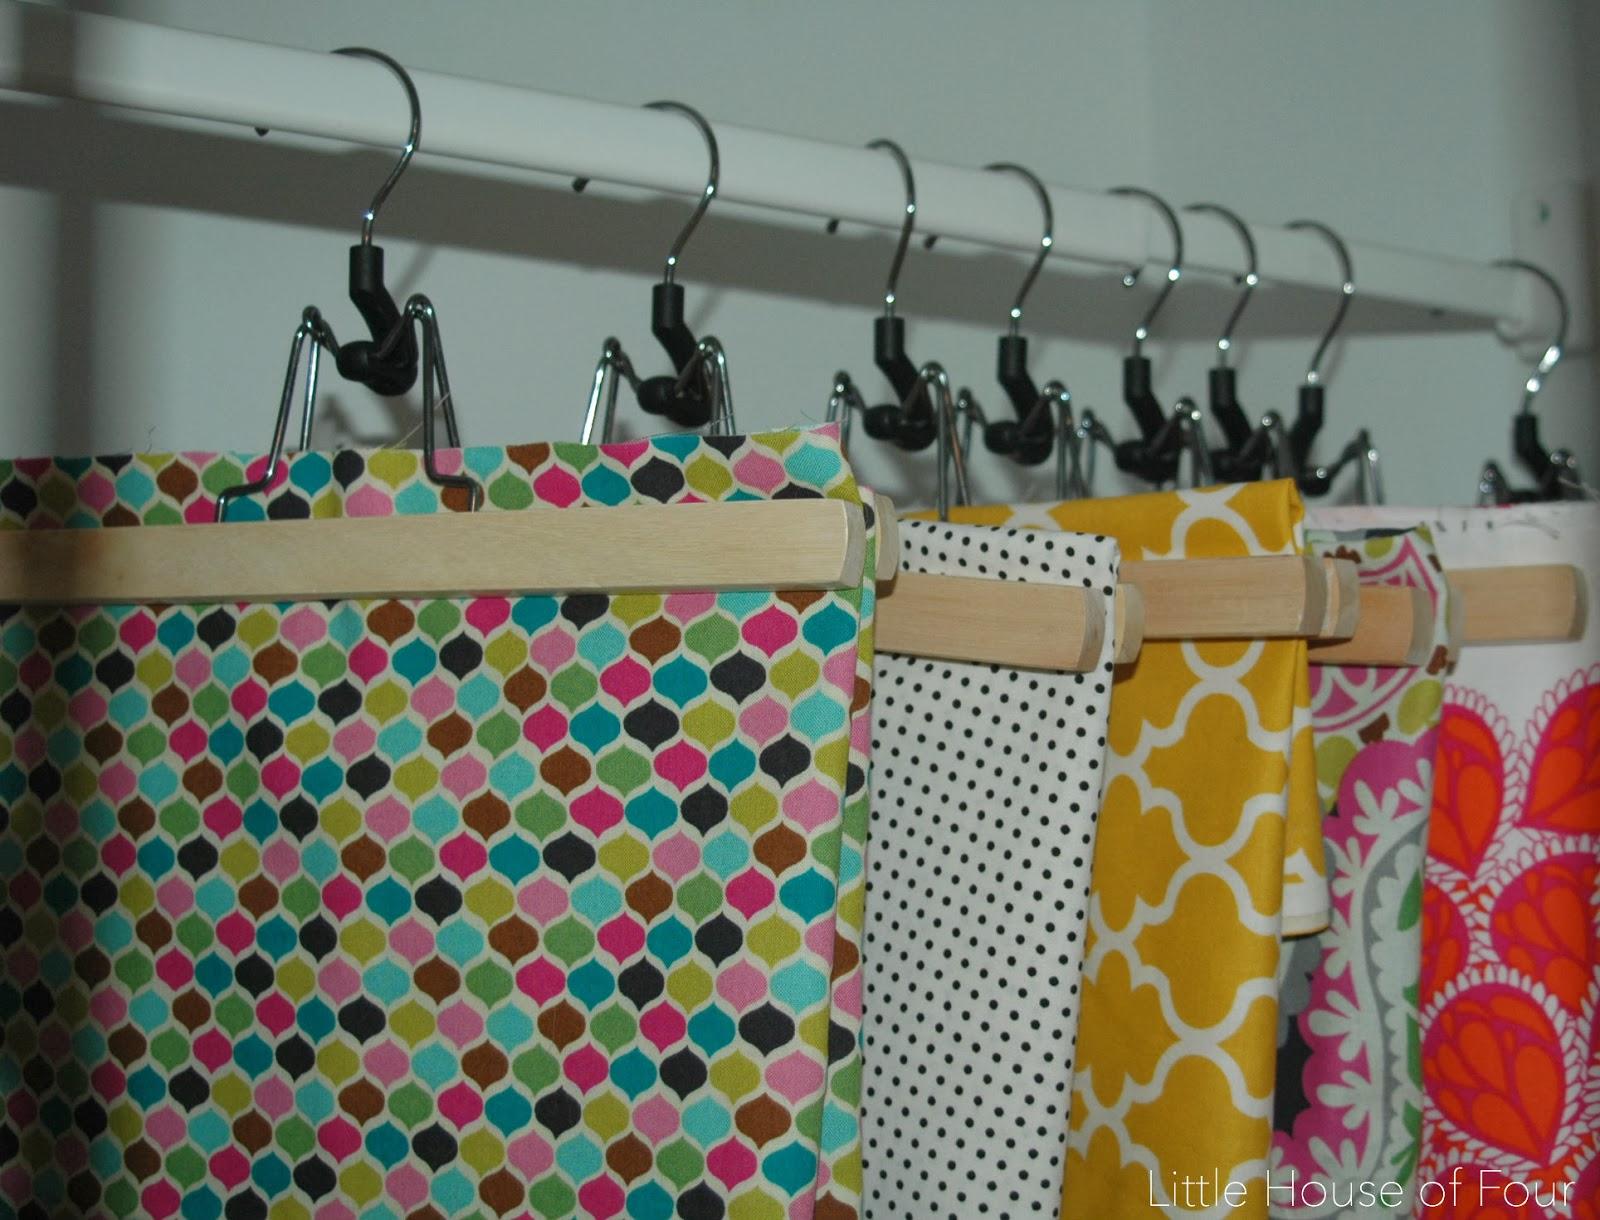 10 creative solutions for storing fabric - Littlehouseoffour.com